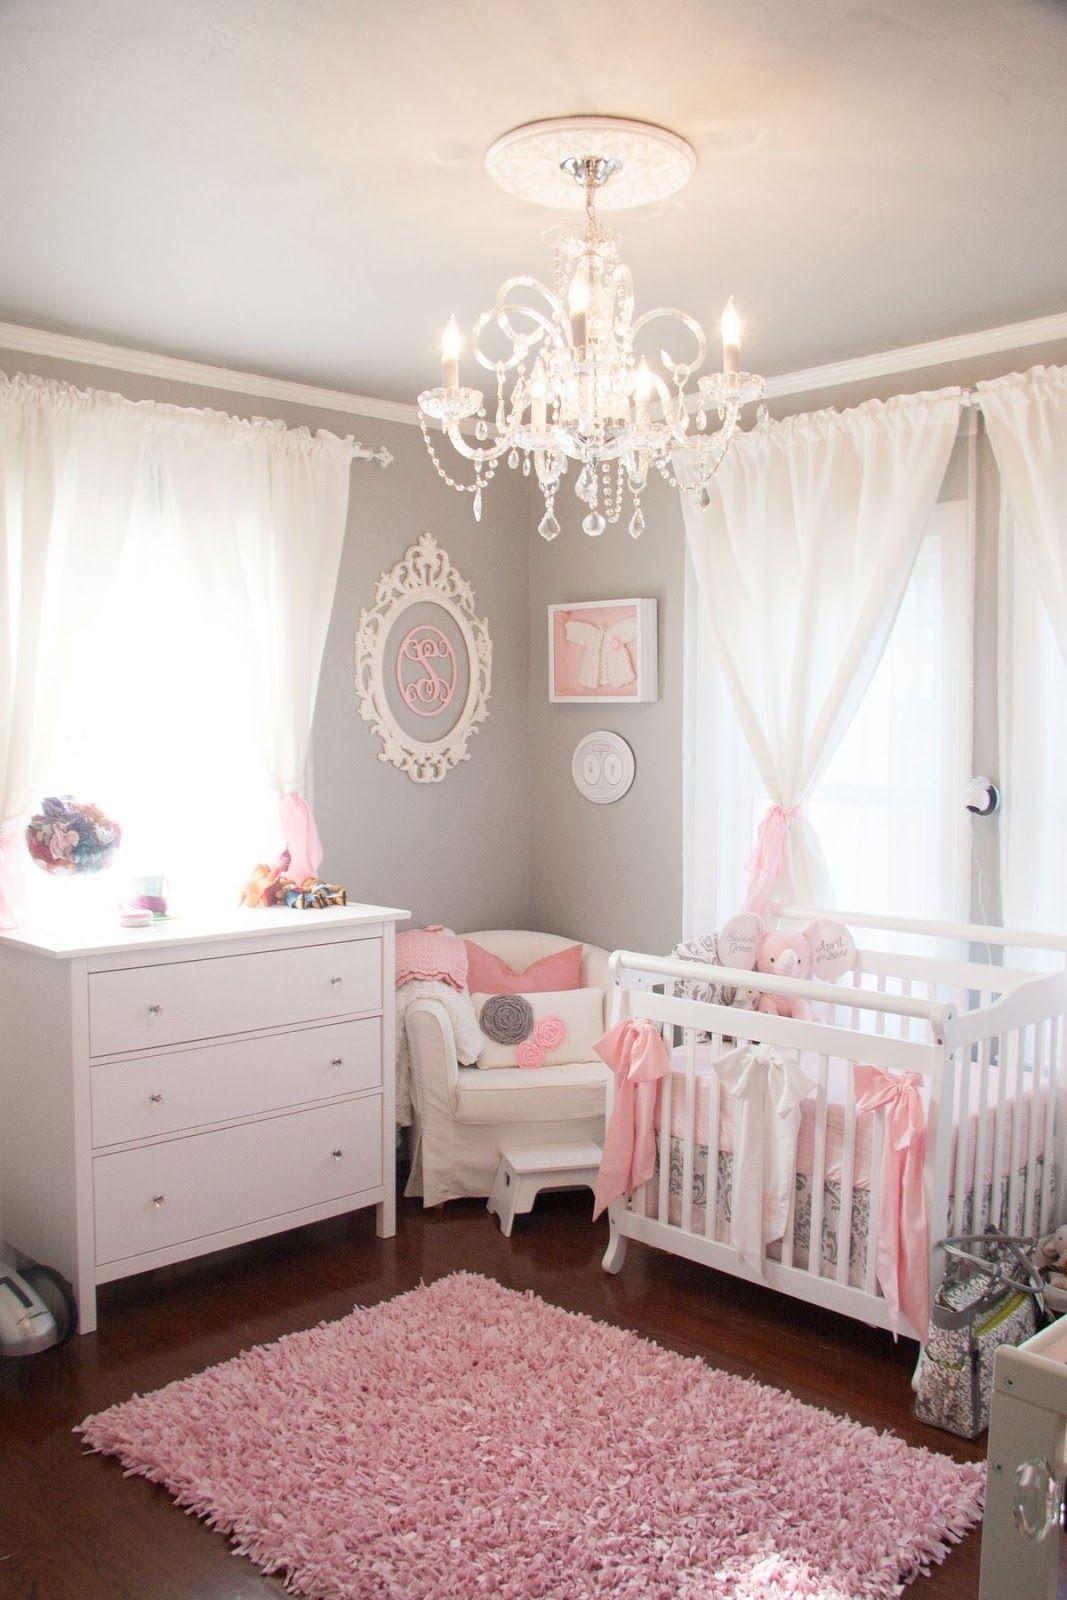 Kids Bedroom Ideas | The most elegant and feminine nursery for their adorable little princess| www.kidsbedroomideas.eu